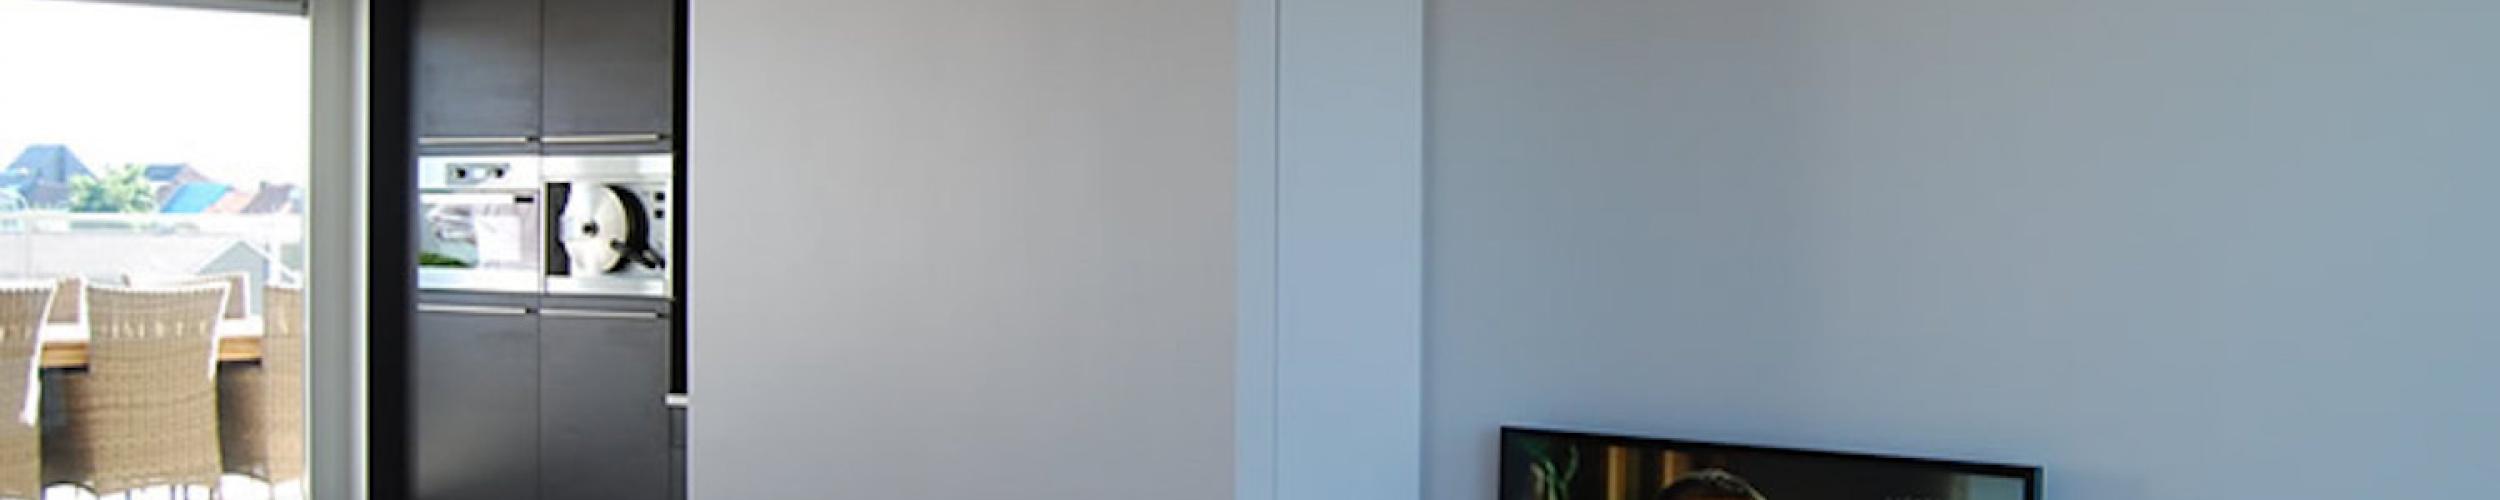 Binnenschilderwerken van appartement